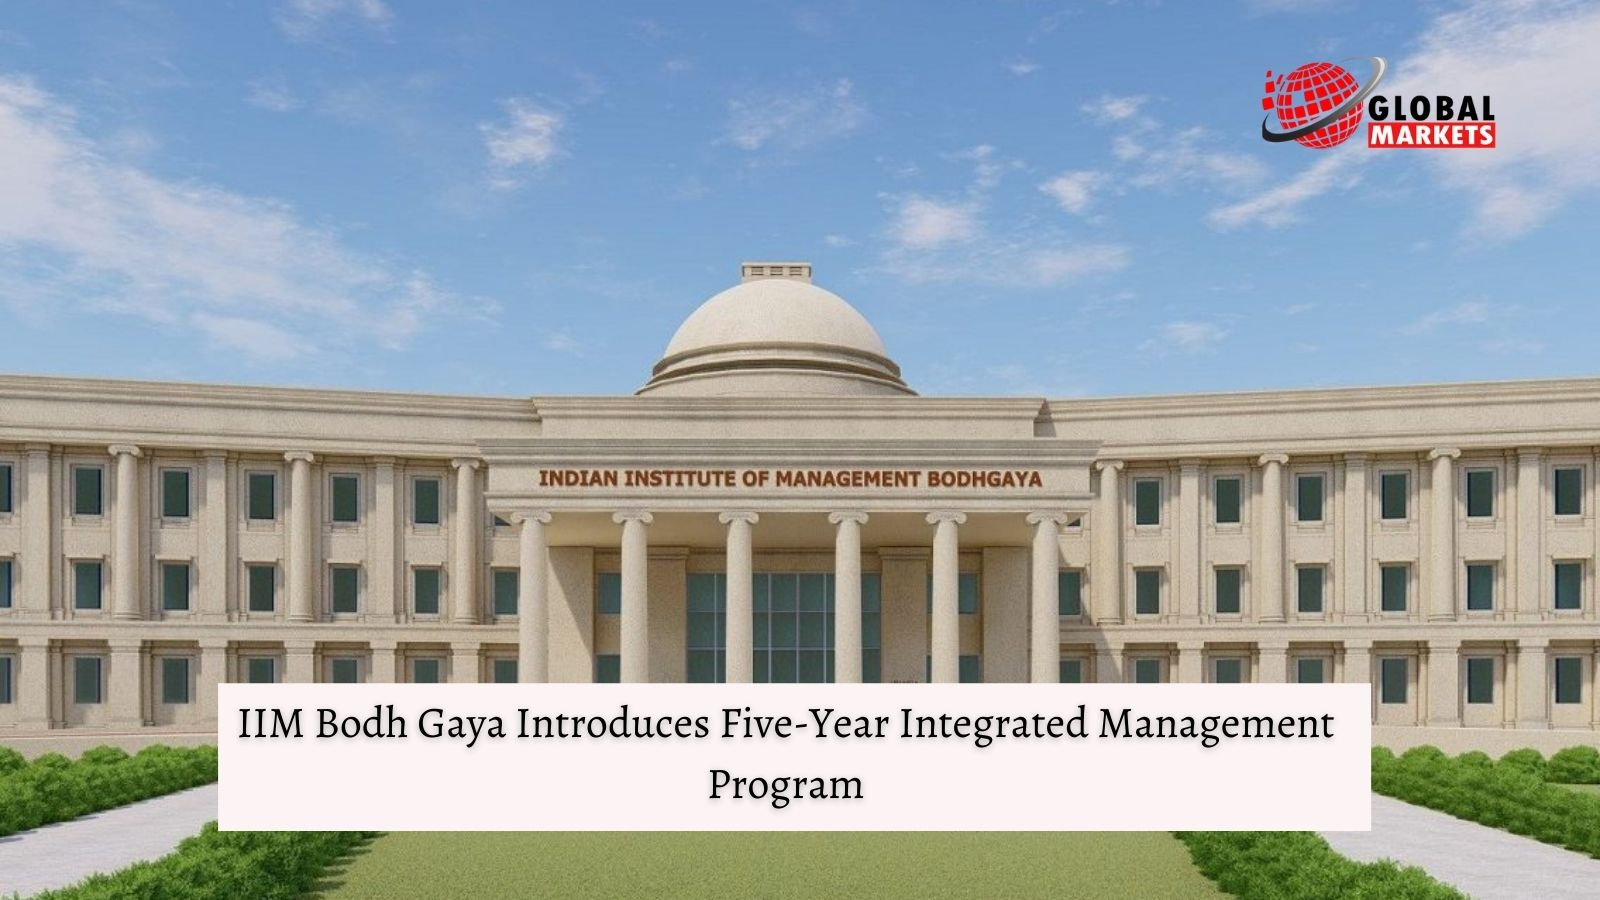 IIM Bodh Gaya Introduces Five-Year Integrated Management Program